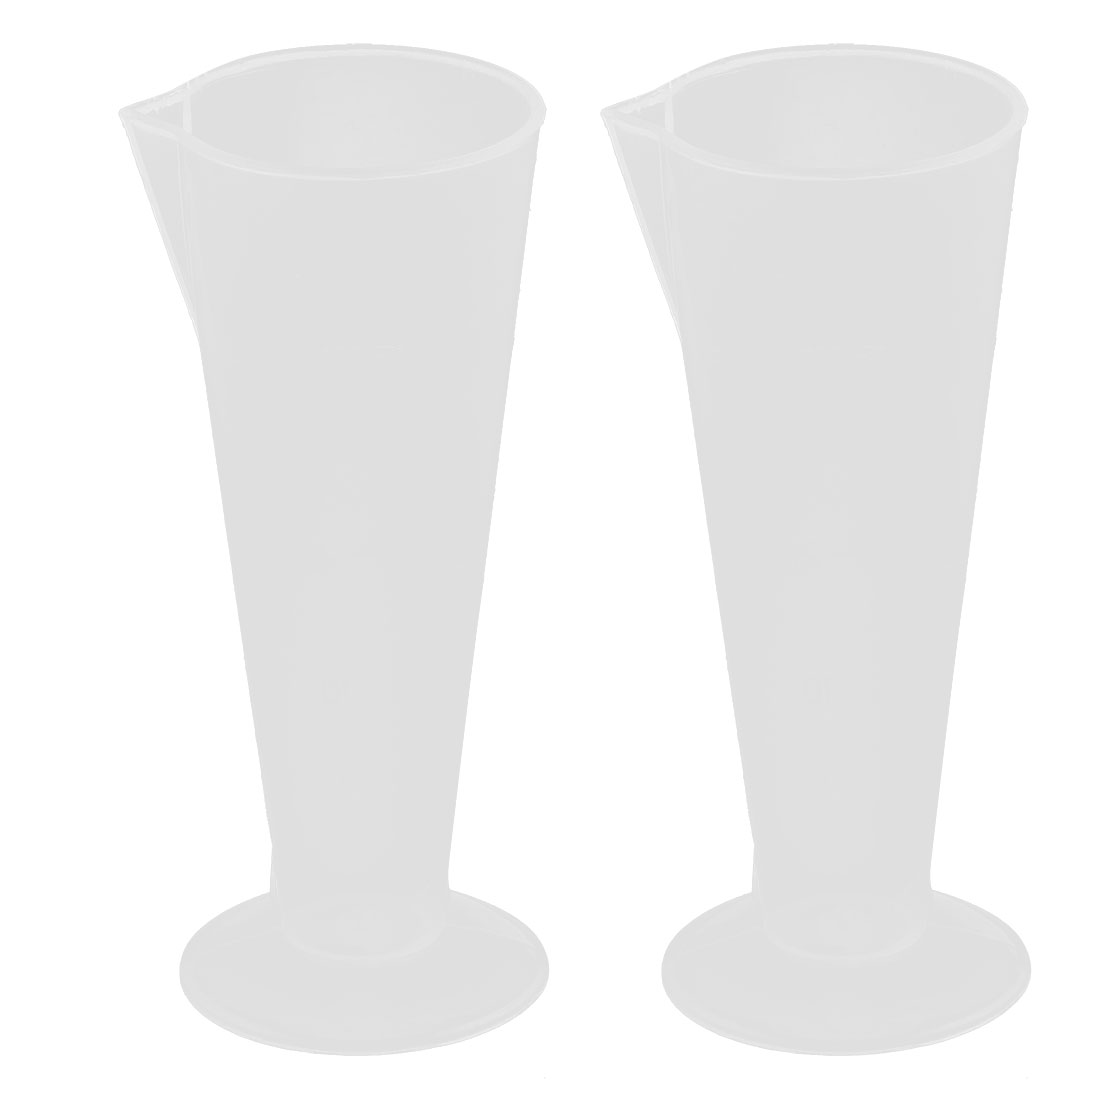 Plastic Water Liquid Testing Beaker Graduated Measuring Cup 50ml 2pcs Clear